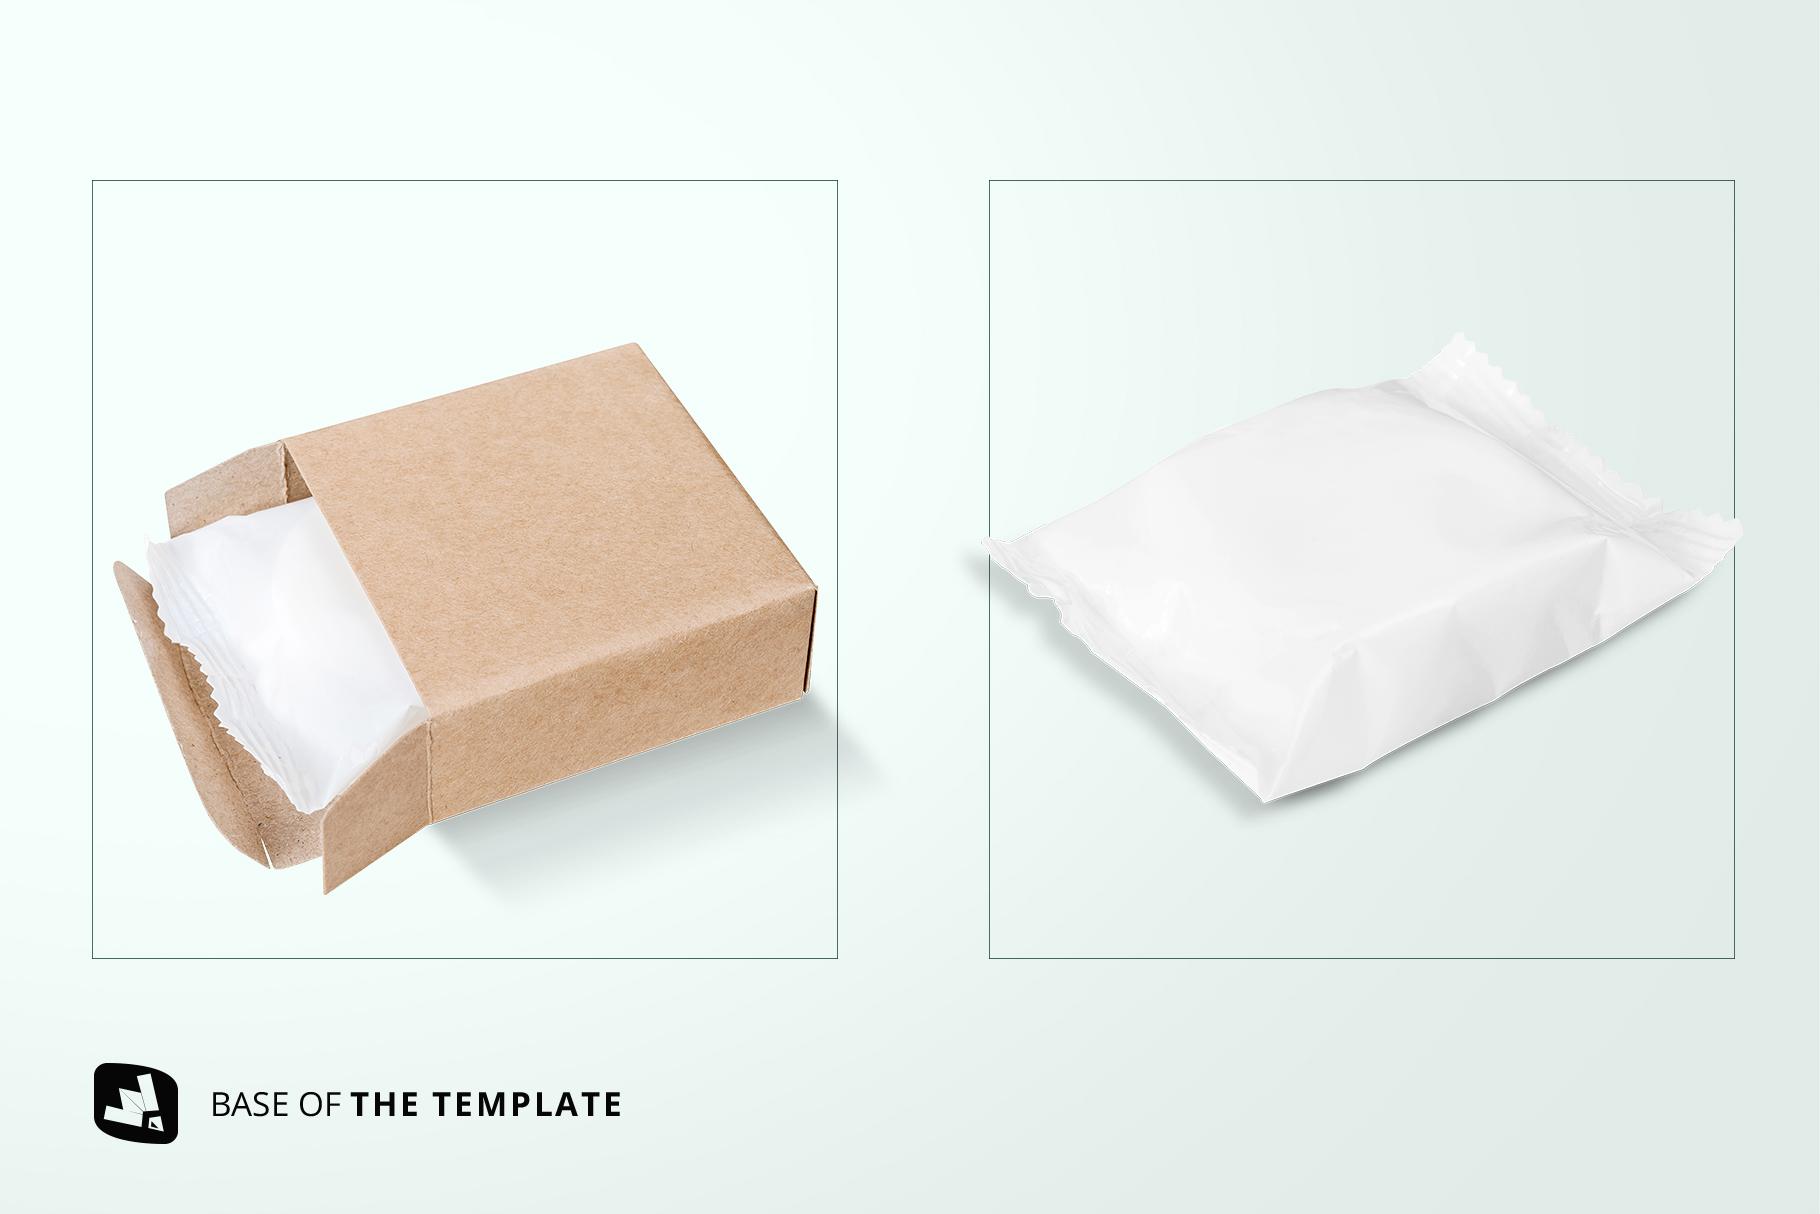 base image of the hand made soap bar packaging mockup